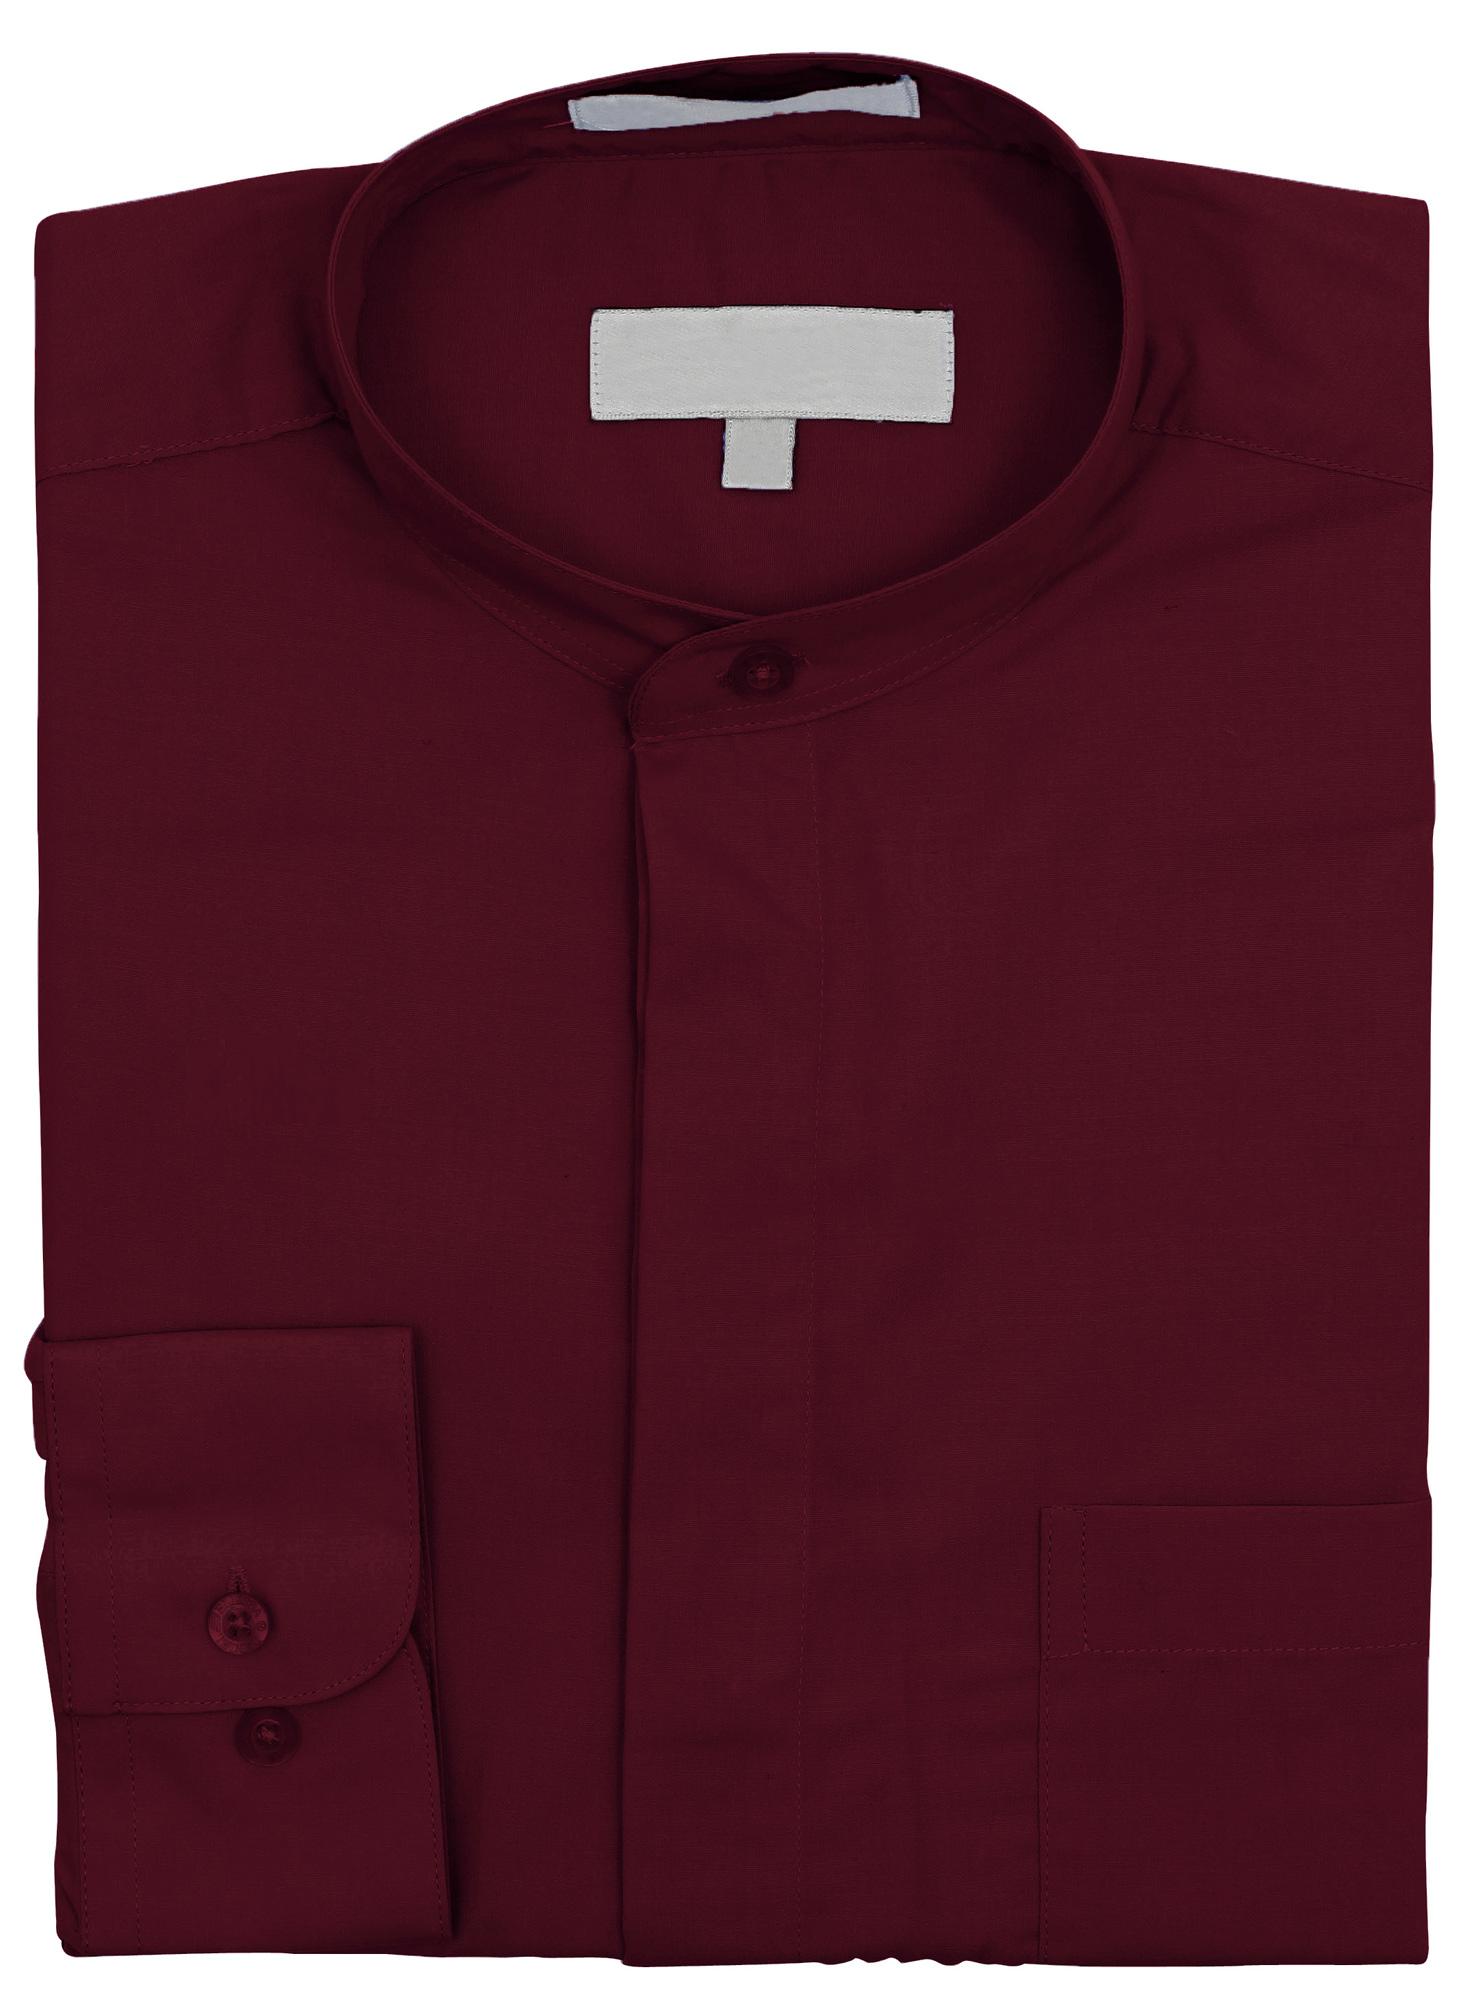 Men-039-s-Collarless-Banded-Collar-Dress-Shirt